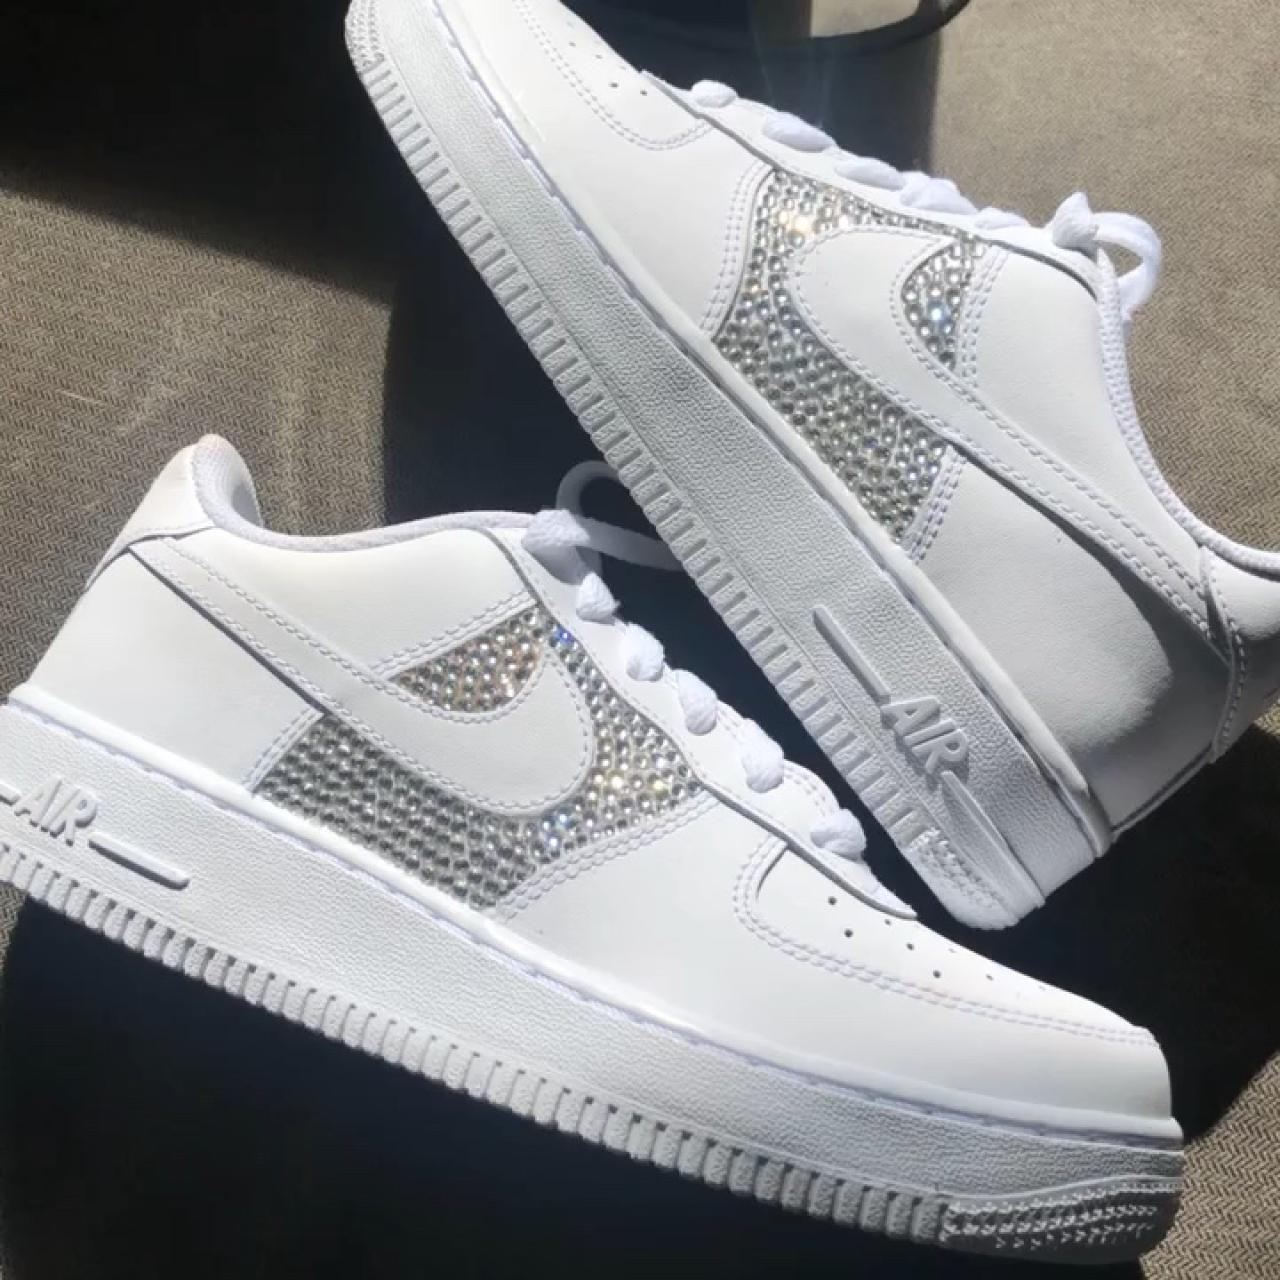 Nike Air Force 1 Rhinestoned Custom And Depop